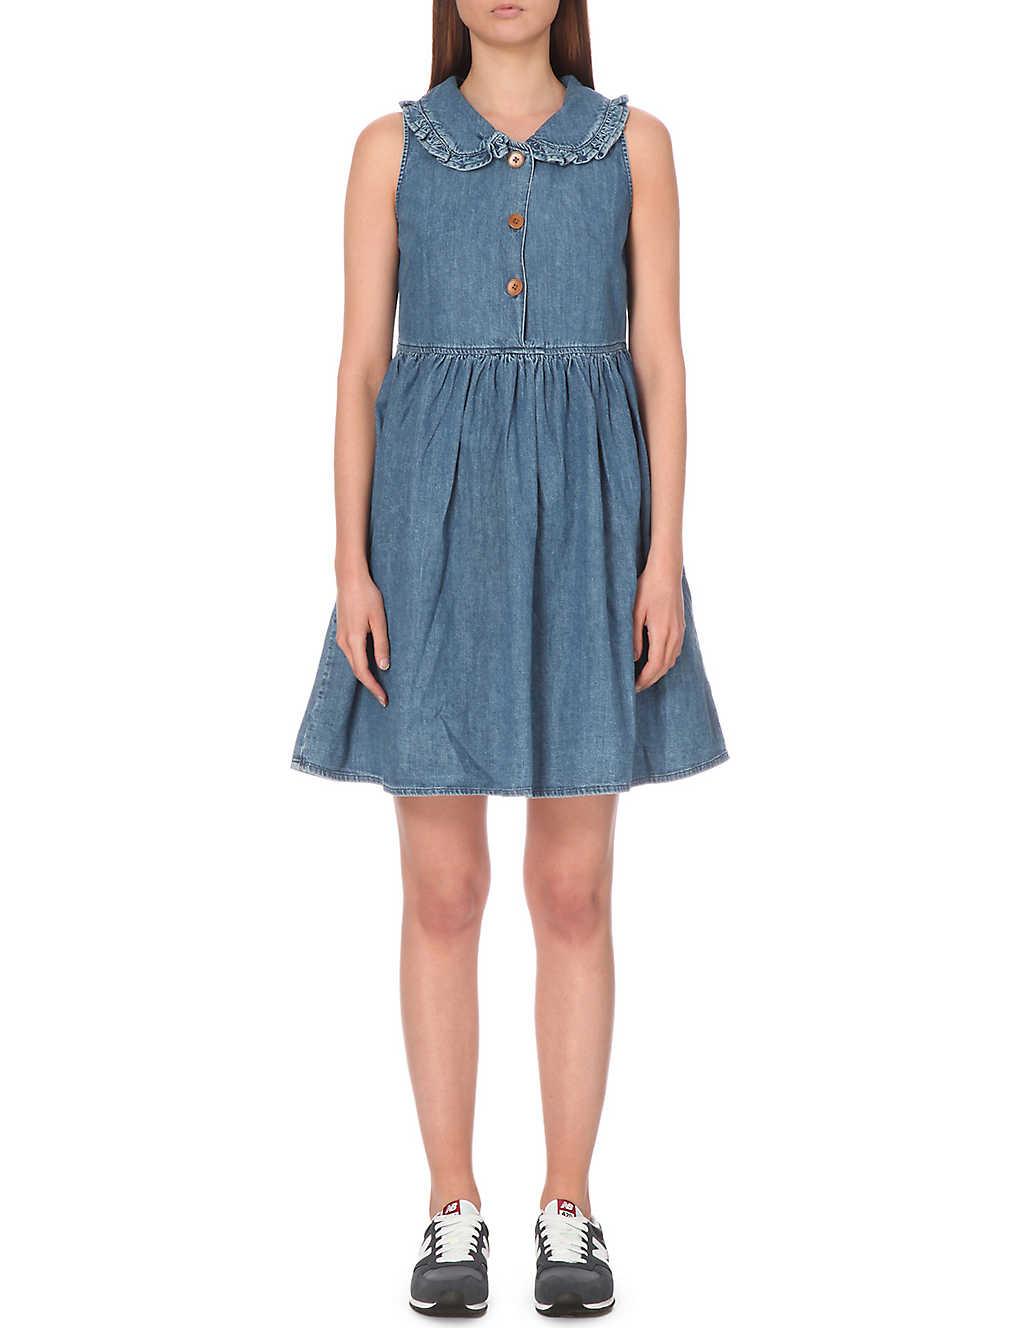 5c7bd89ec2e MIH JEANS - frilled collar denim dress